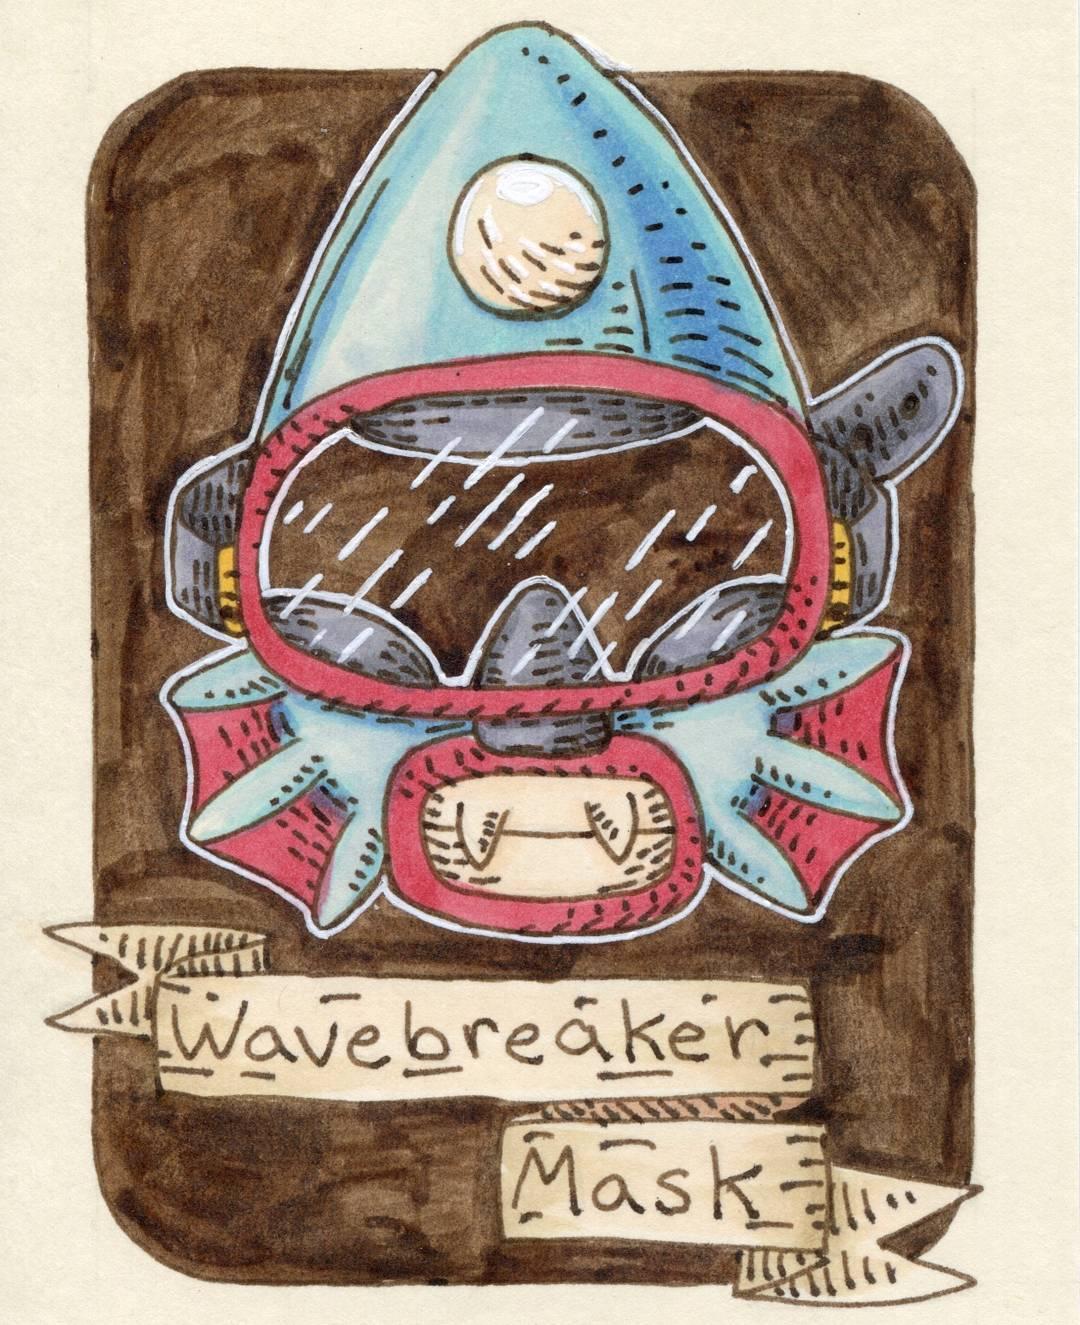 "redjarojam ""Wavebreaker Mask"" - by Jared DeCosta (redjarojam) www.instagram.com/redjarojam (2018-02) © dell'autore tutti i diritti riservati"